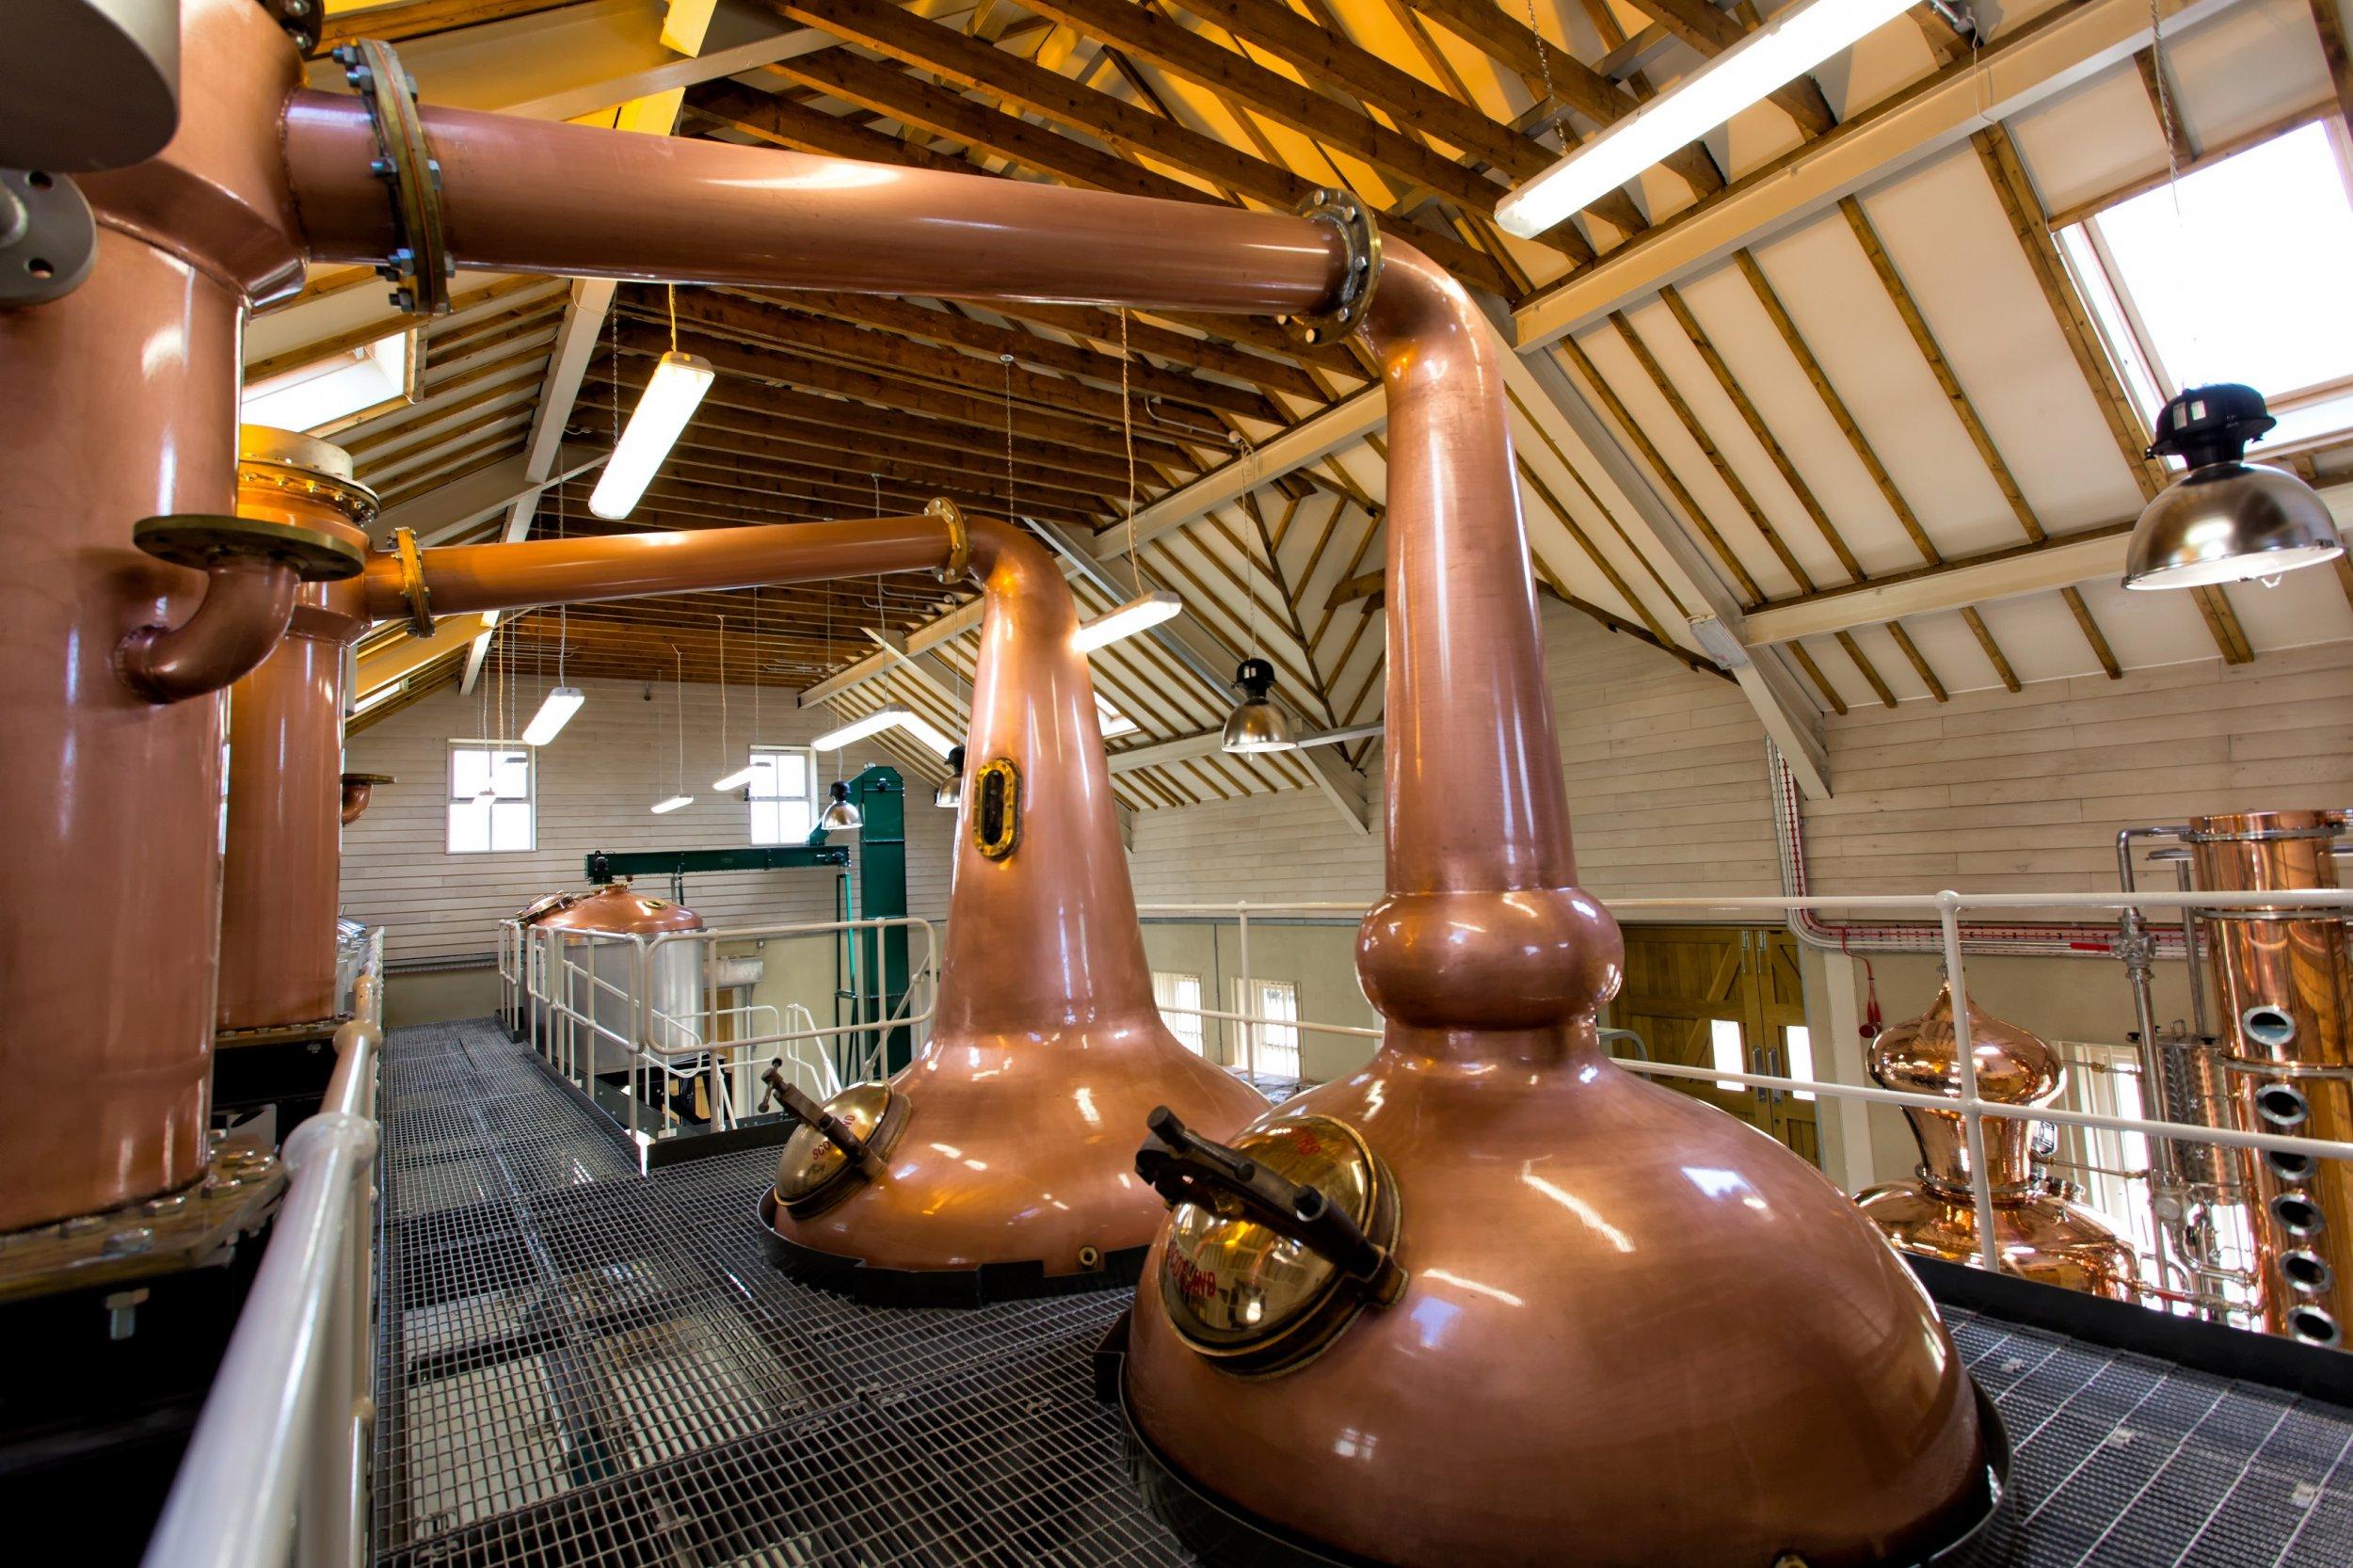 The_Cotswold_Distilling_Company_Ltd_MG_9949